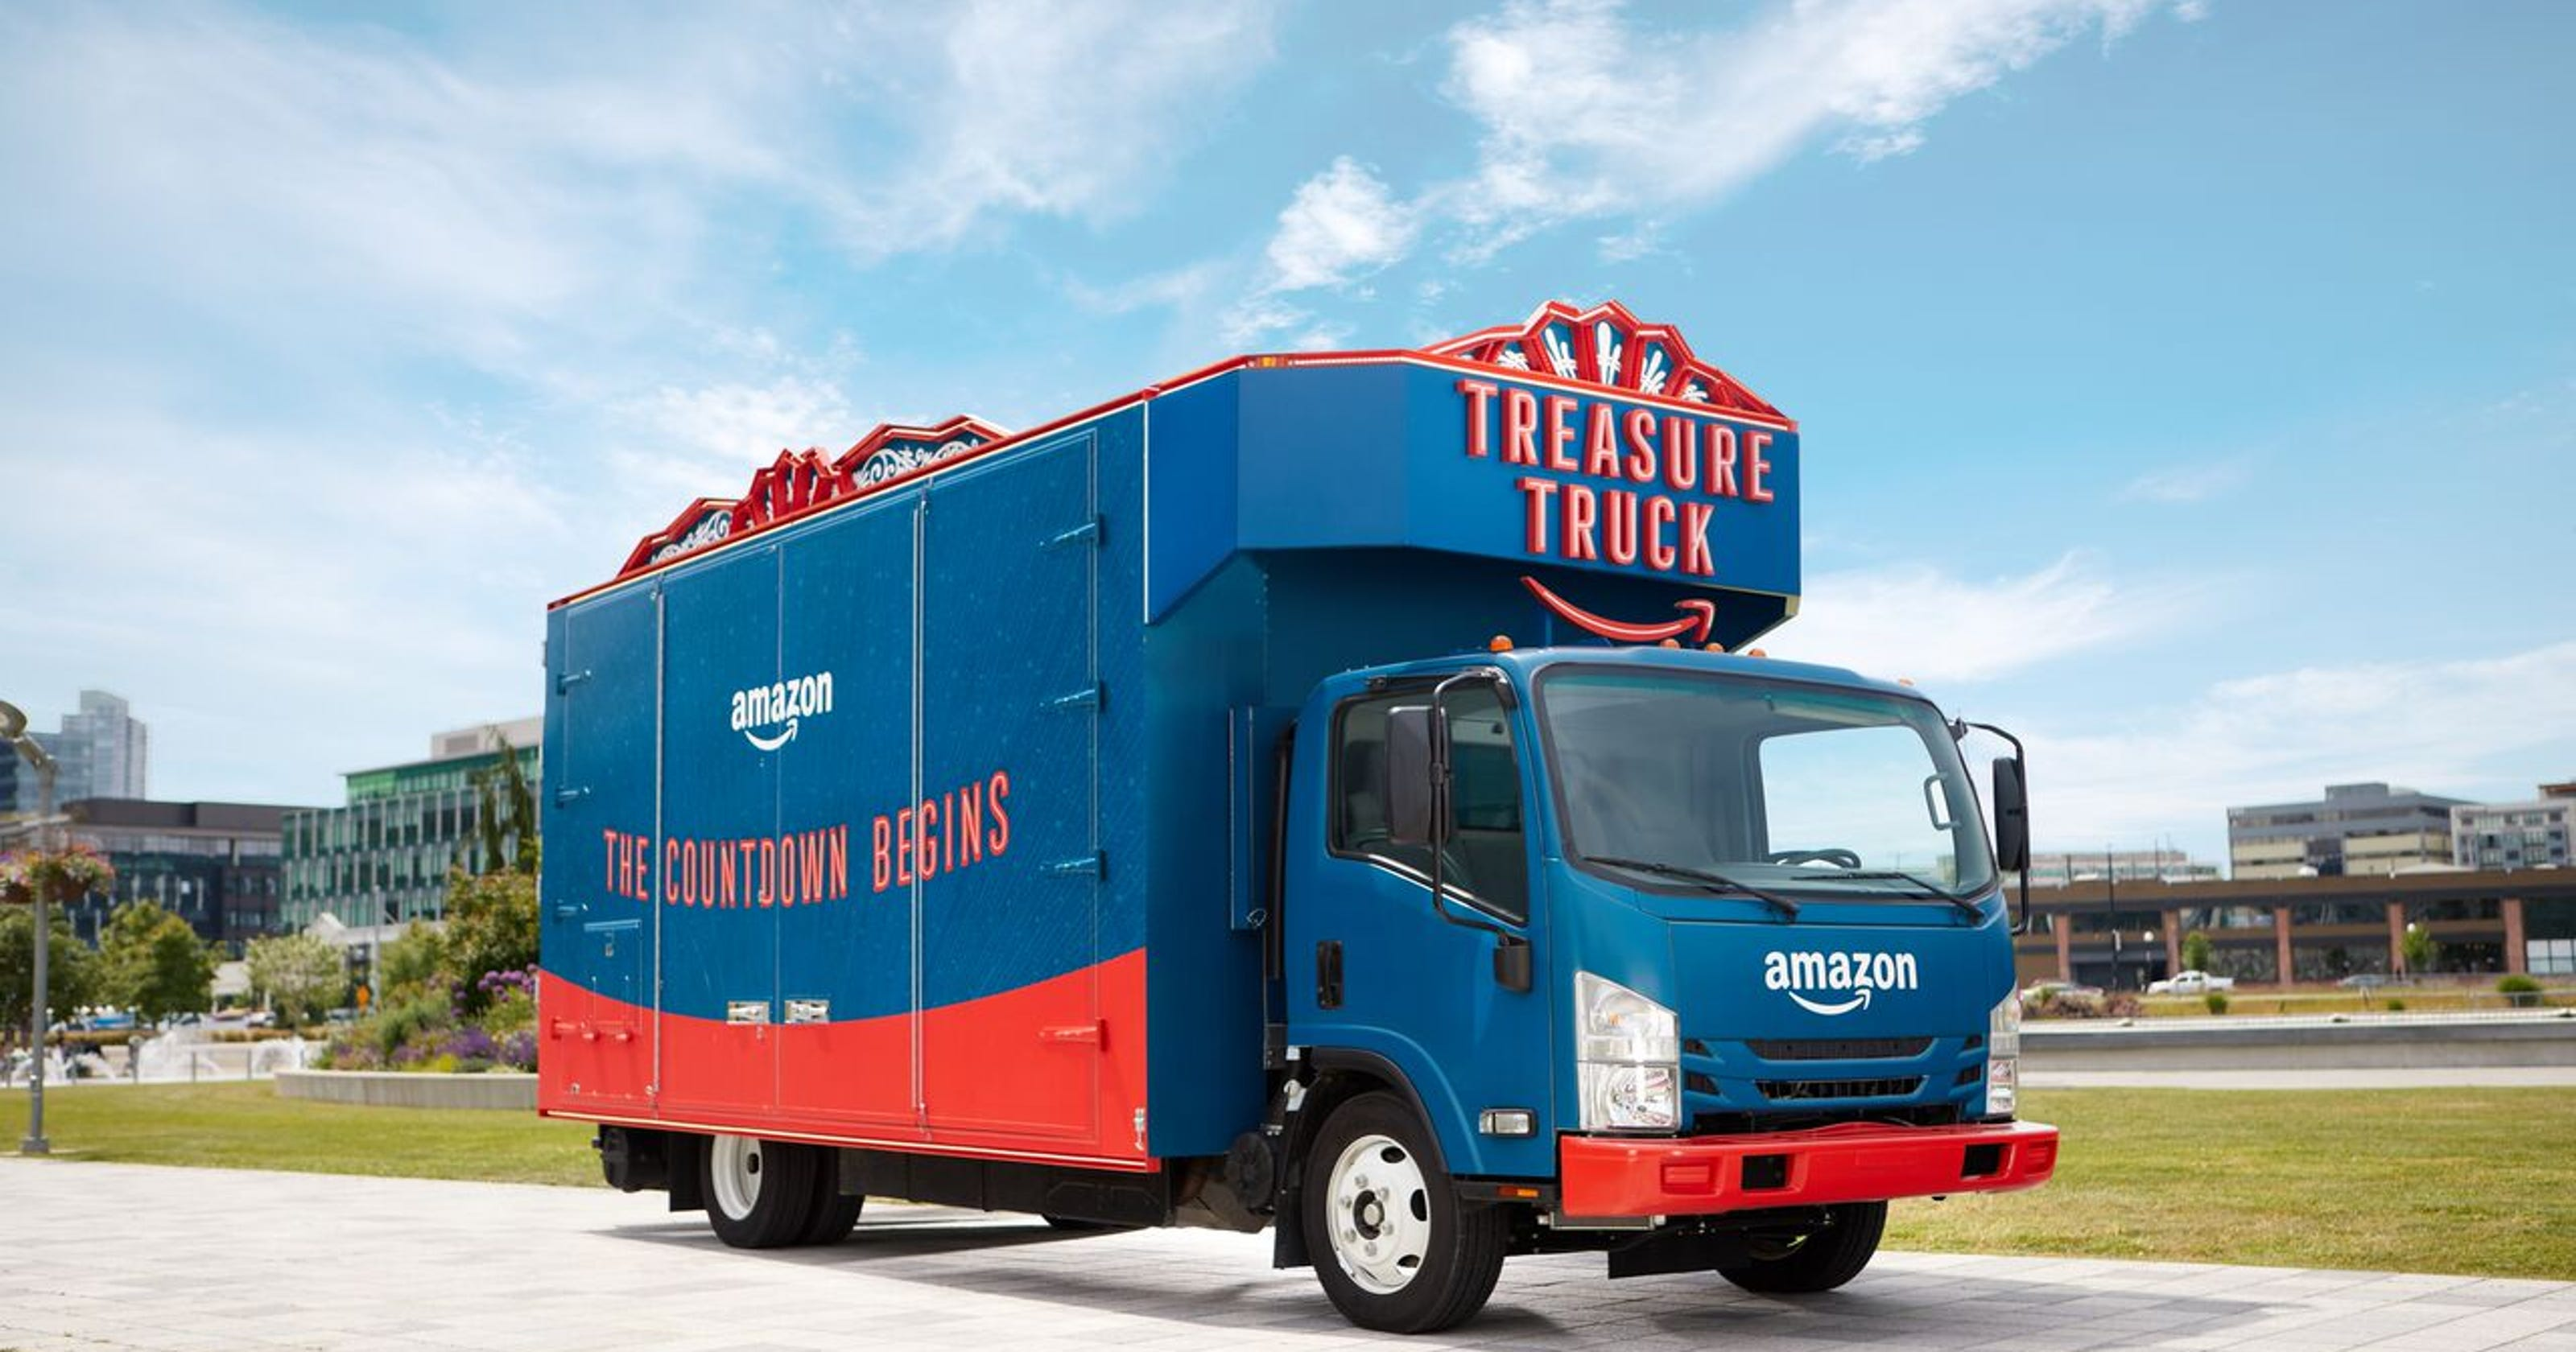 Buy Here Pay Here Phoenix >> Amazon's Phoenix 'Treasure Truck': Here's how it works